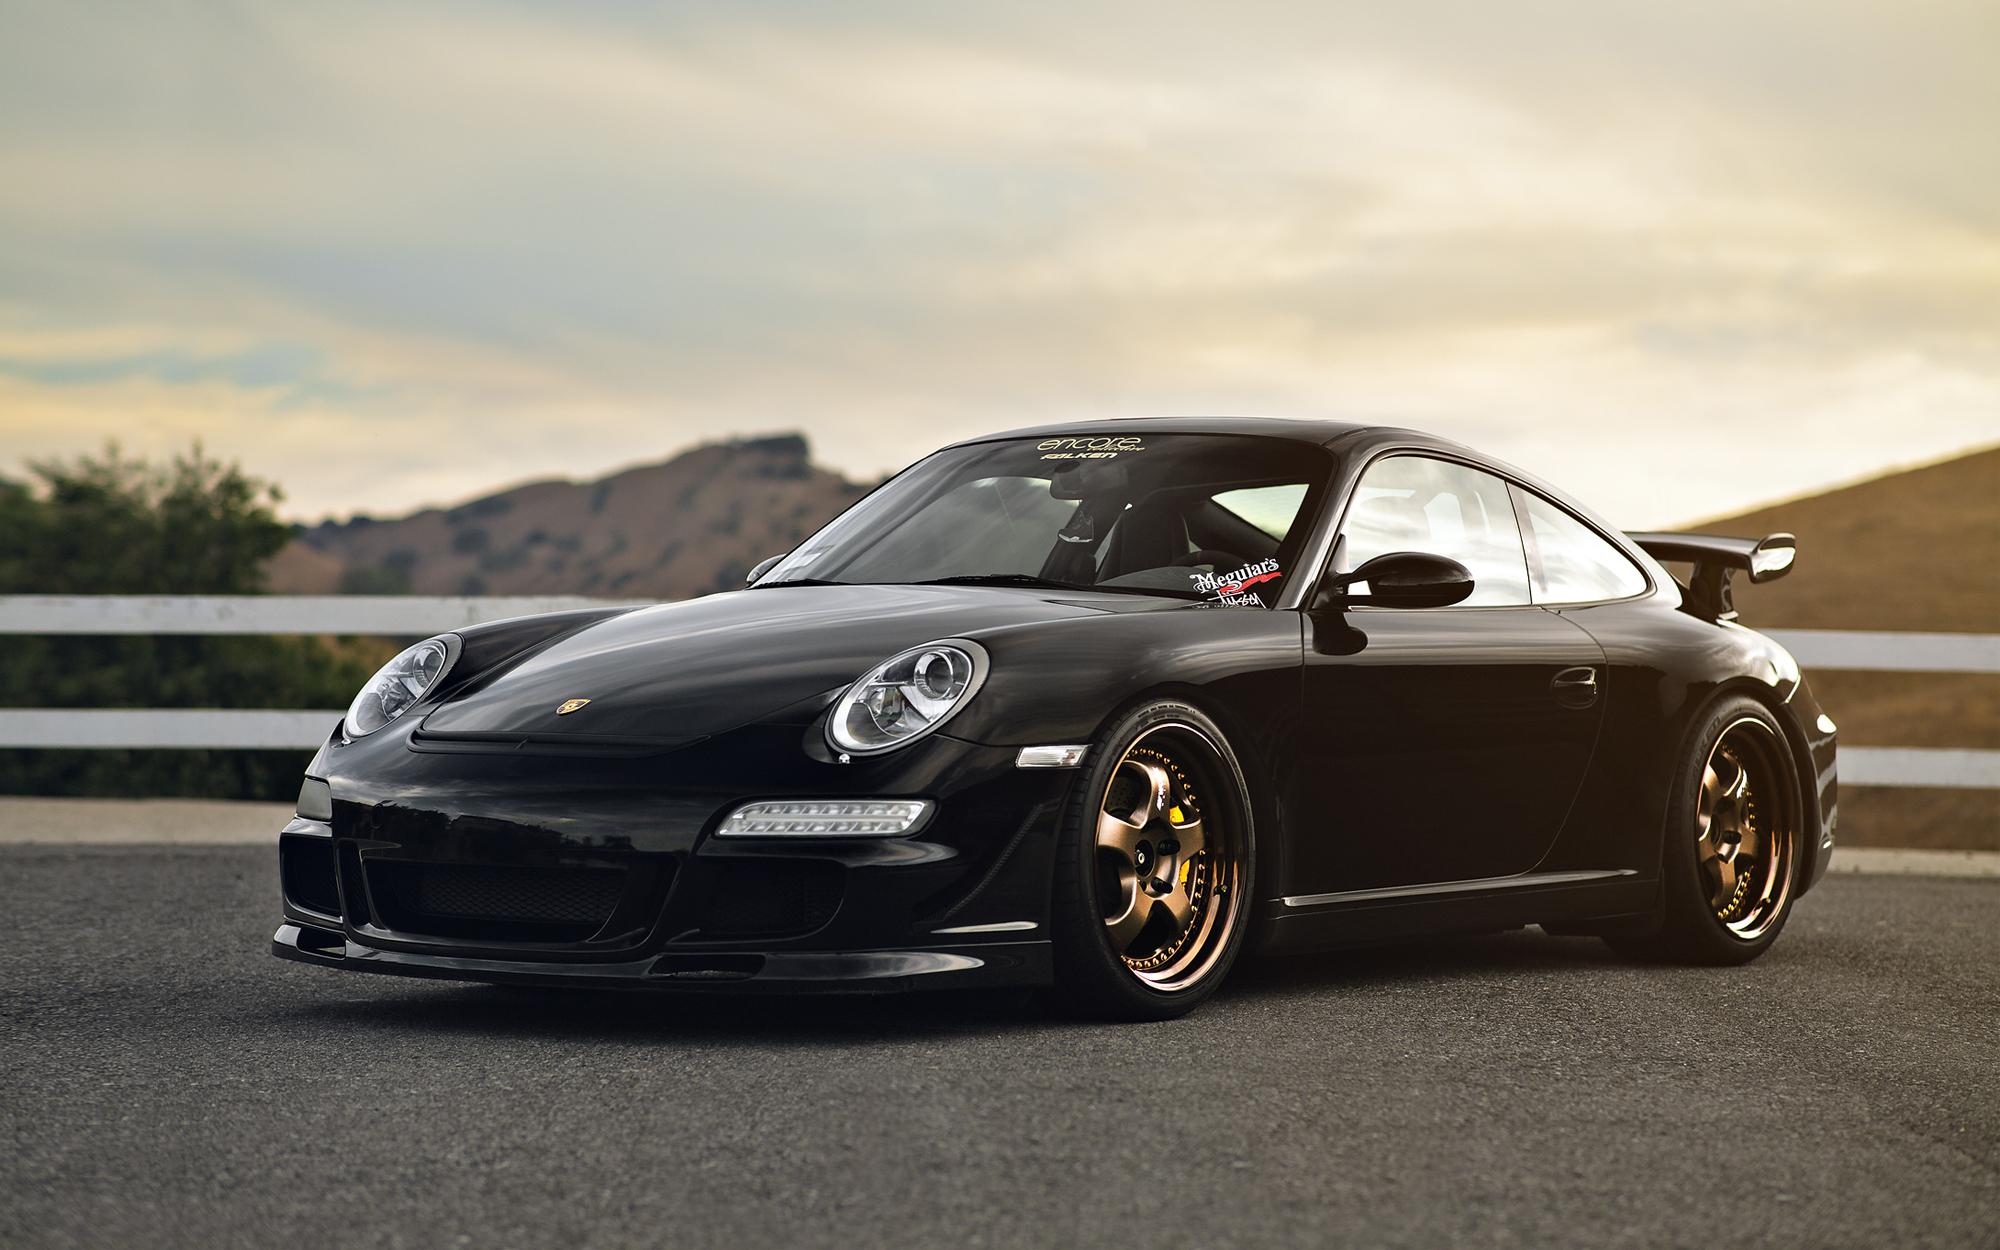 Porsche 911 Wallpapers Pictures Images 2000x1250